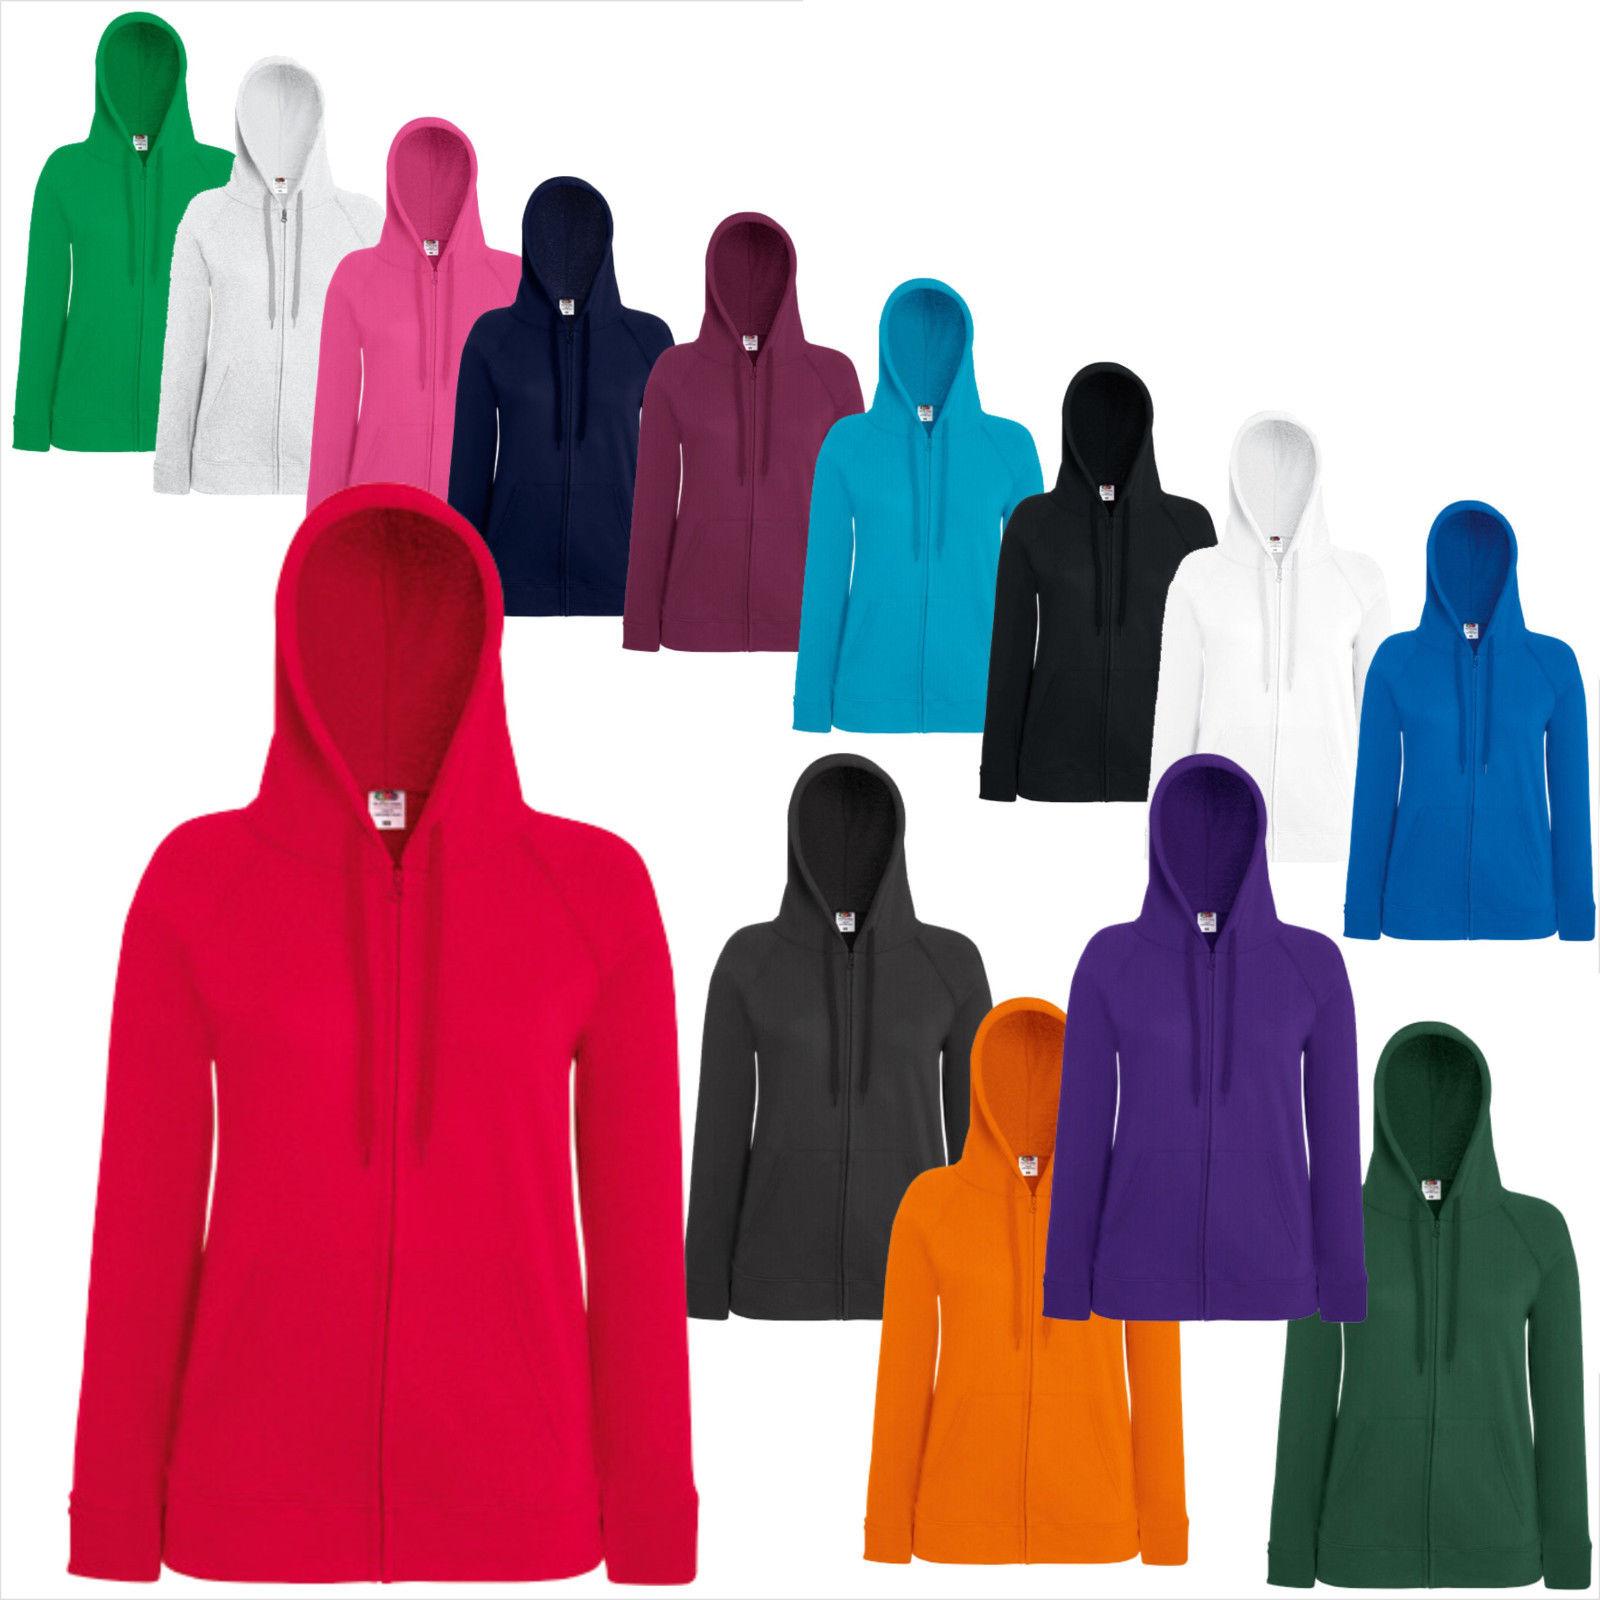 FRUIT OF THE LOOM Lady-Fit Lightweight Hooded Sweat Jacke XS S M L XL XXL (B)FOL